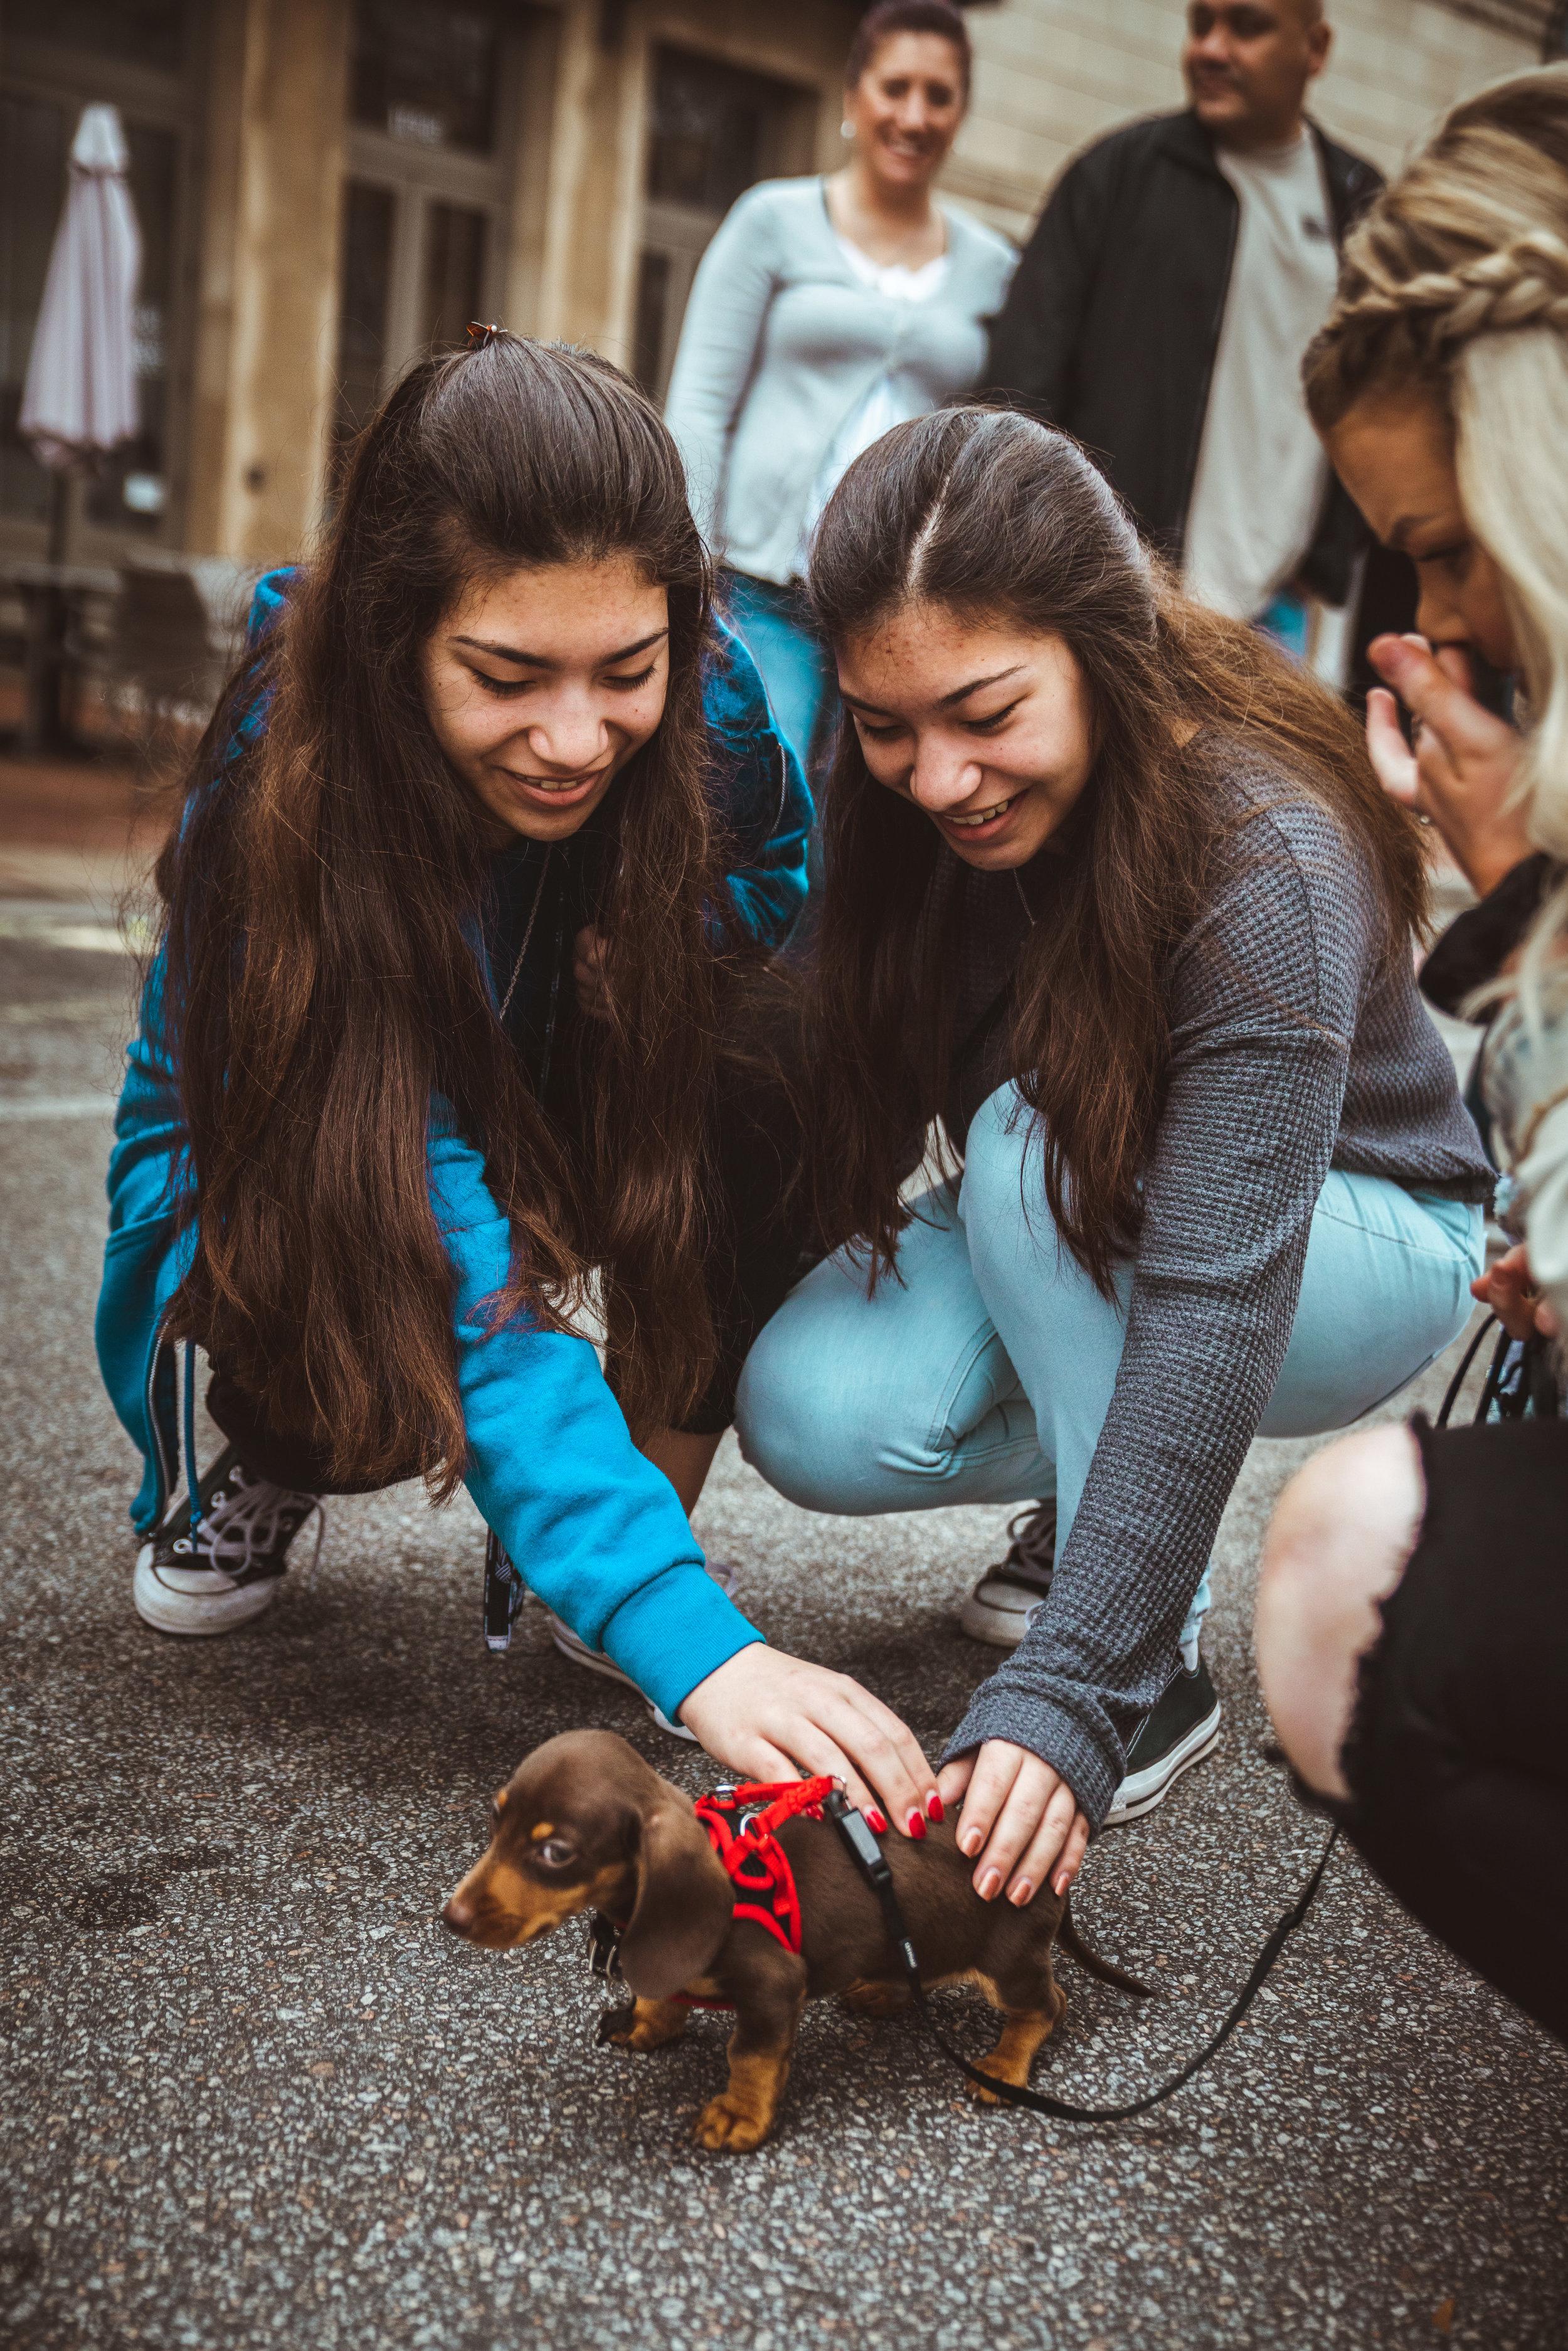 Puppy love by Paul Chelmis